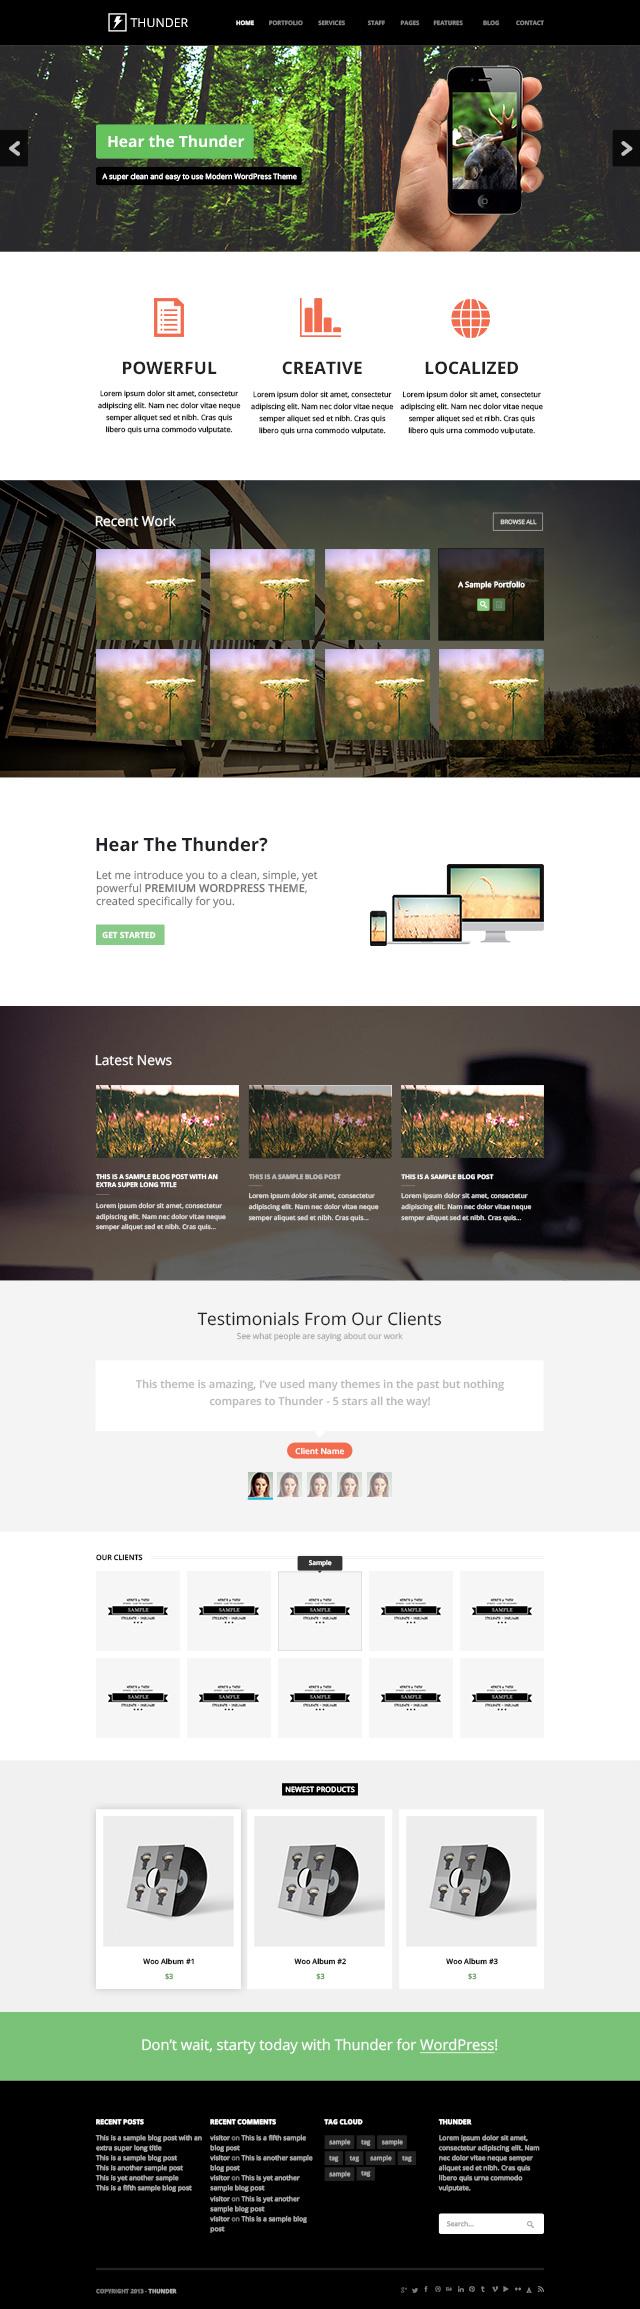 Plantilla PSD para diseño web gratis